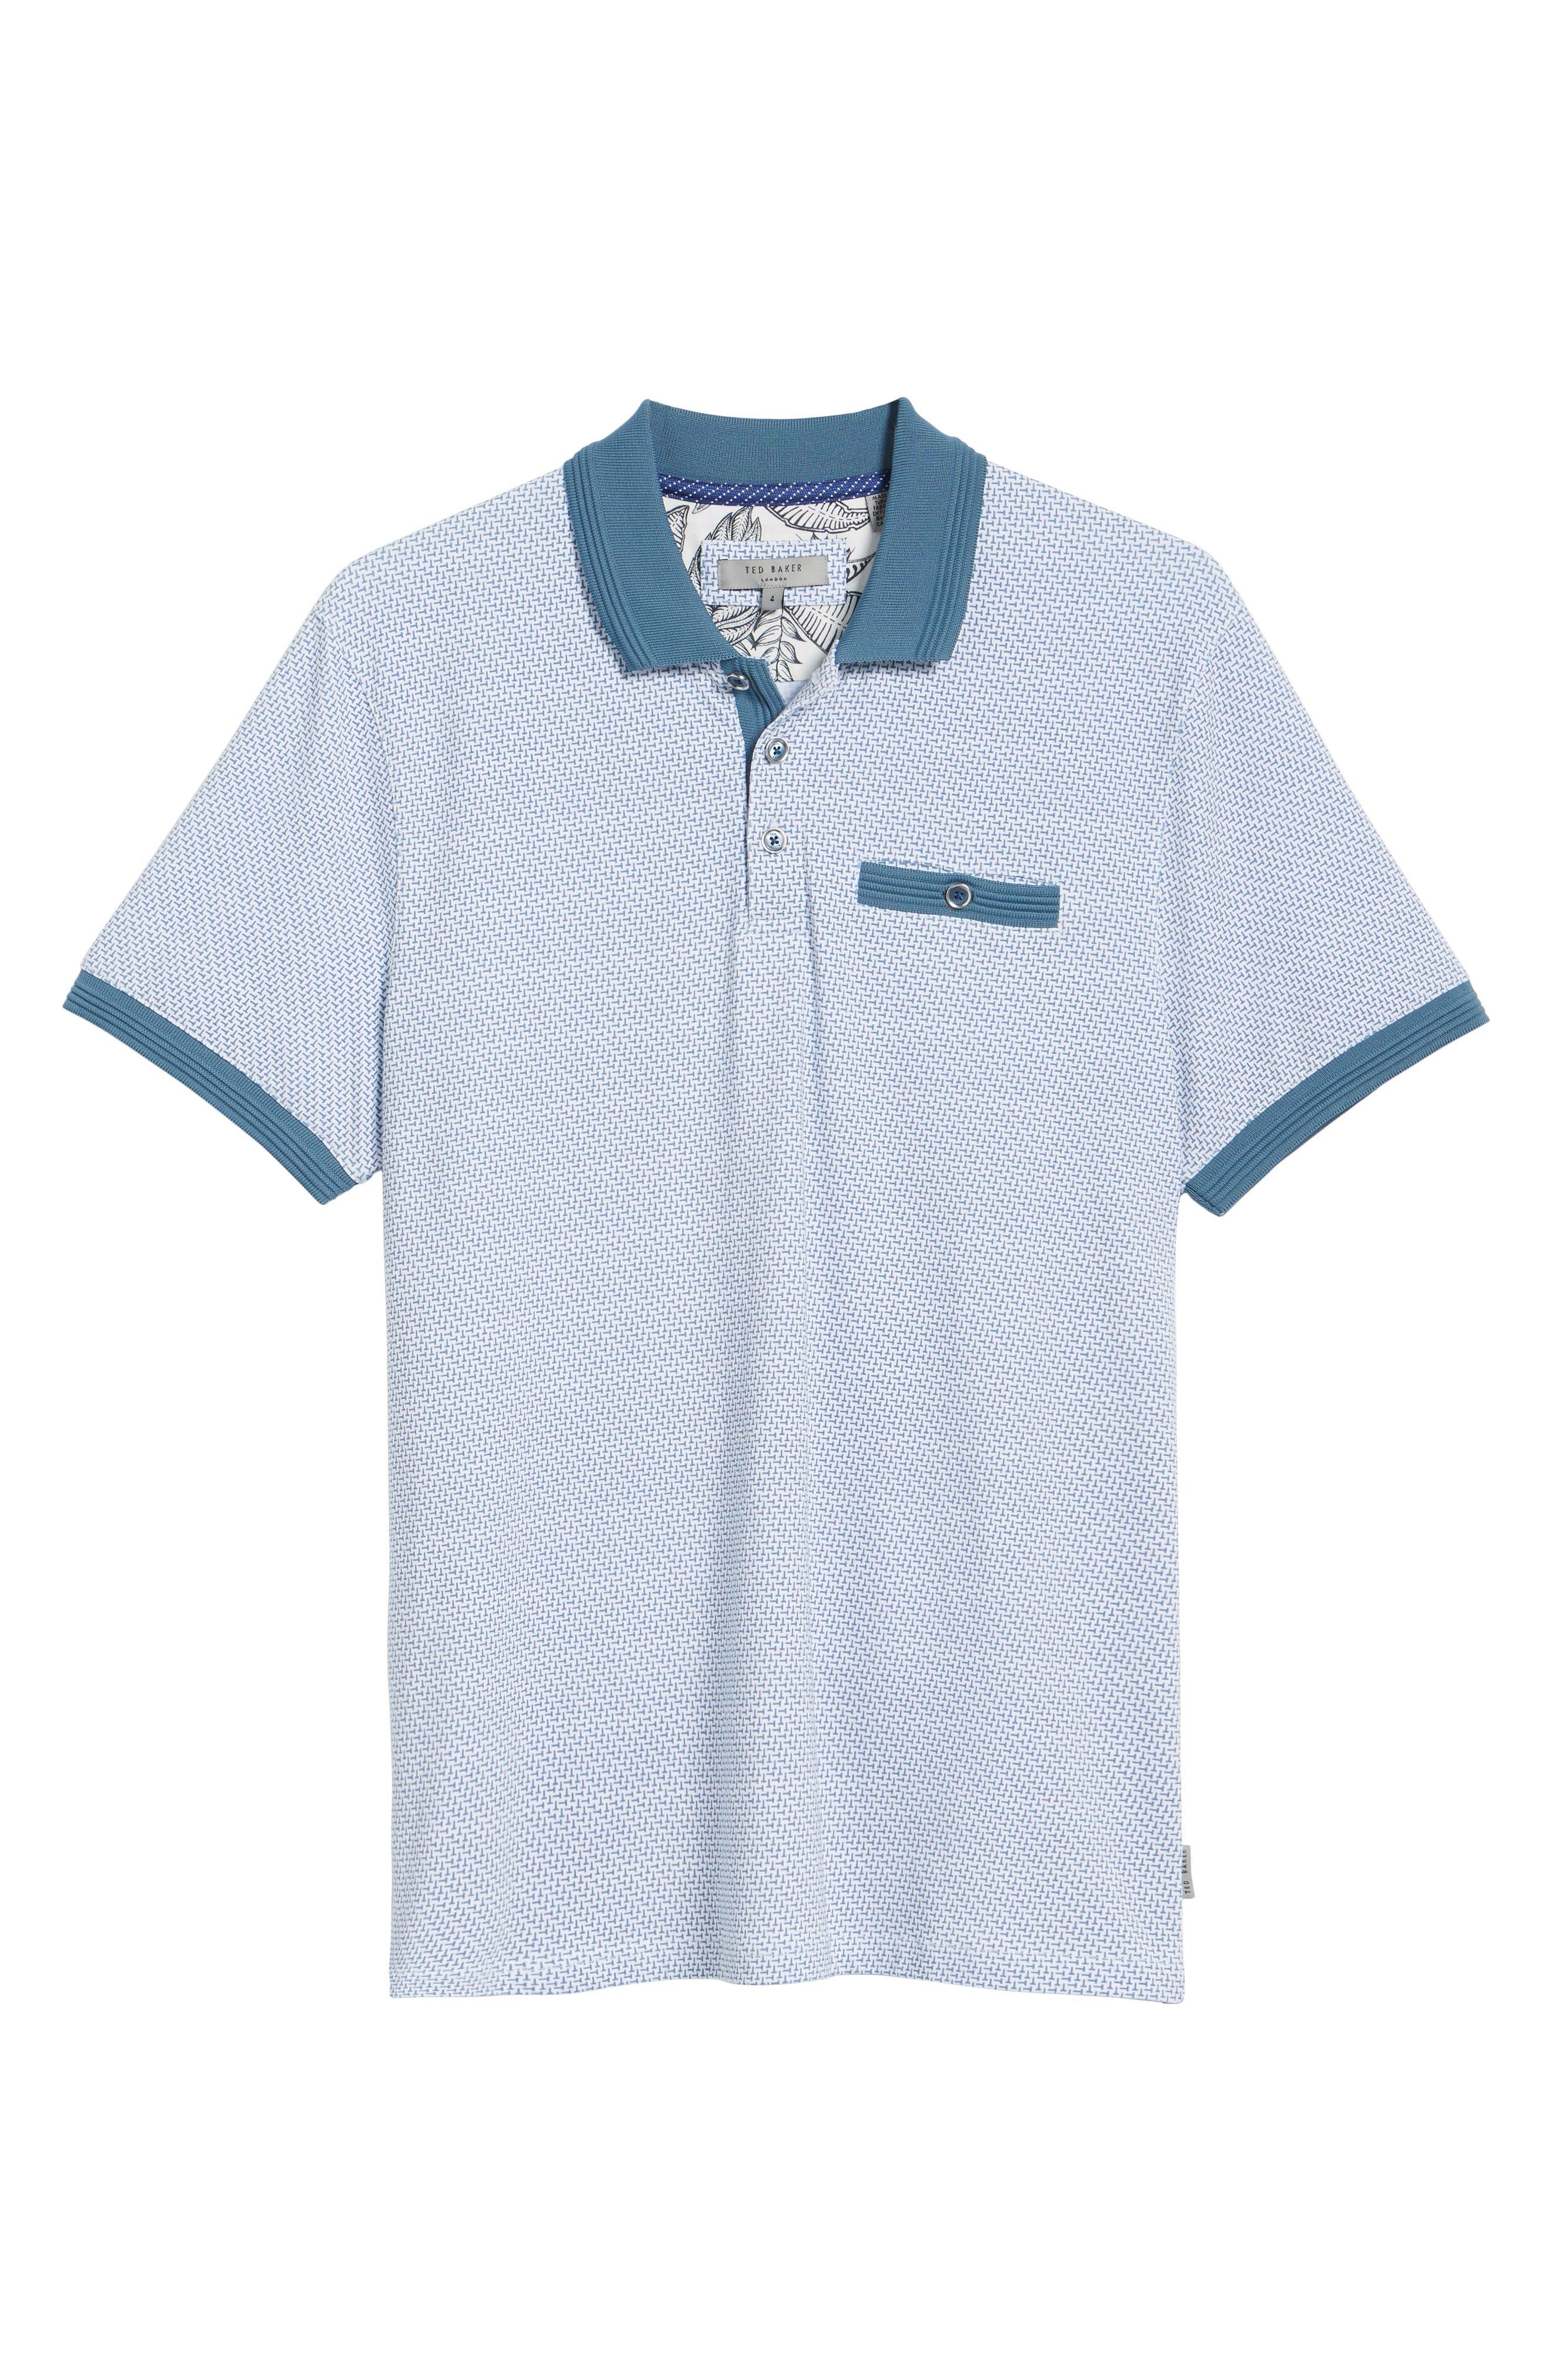 Sloughi Trim Fit Stretch Polo Shirt,                             Alternate thumbnail 6, color,                             400